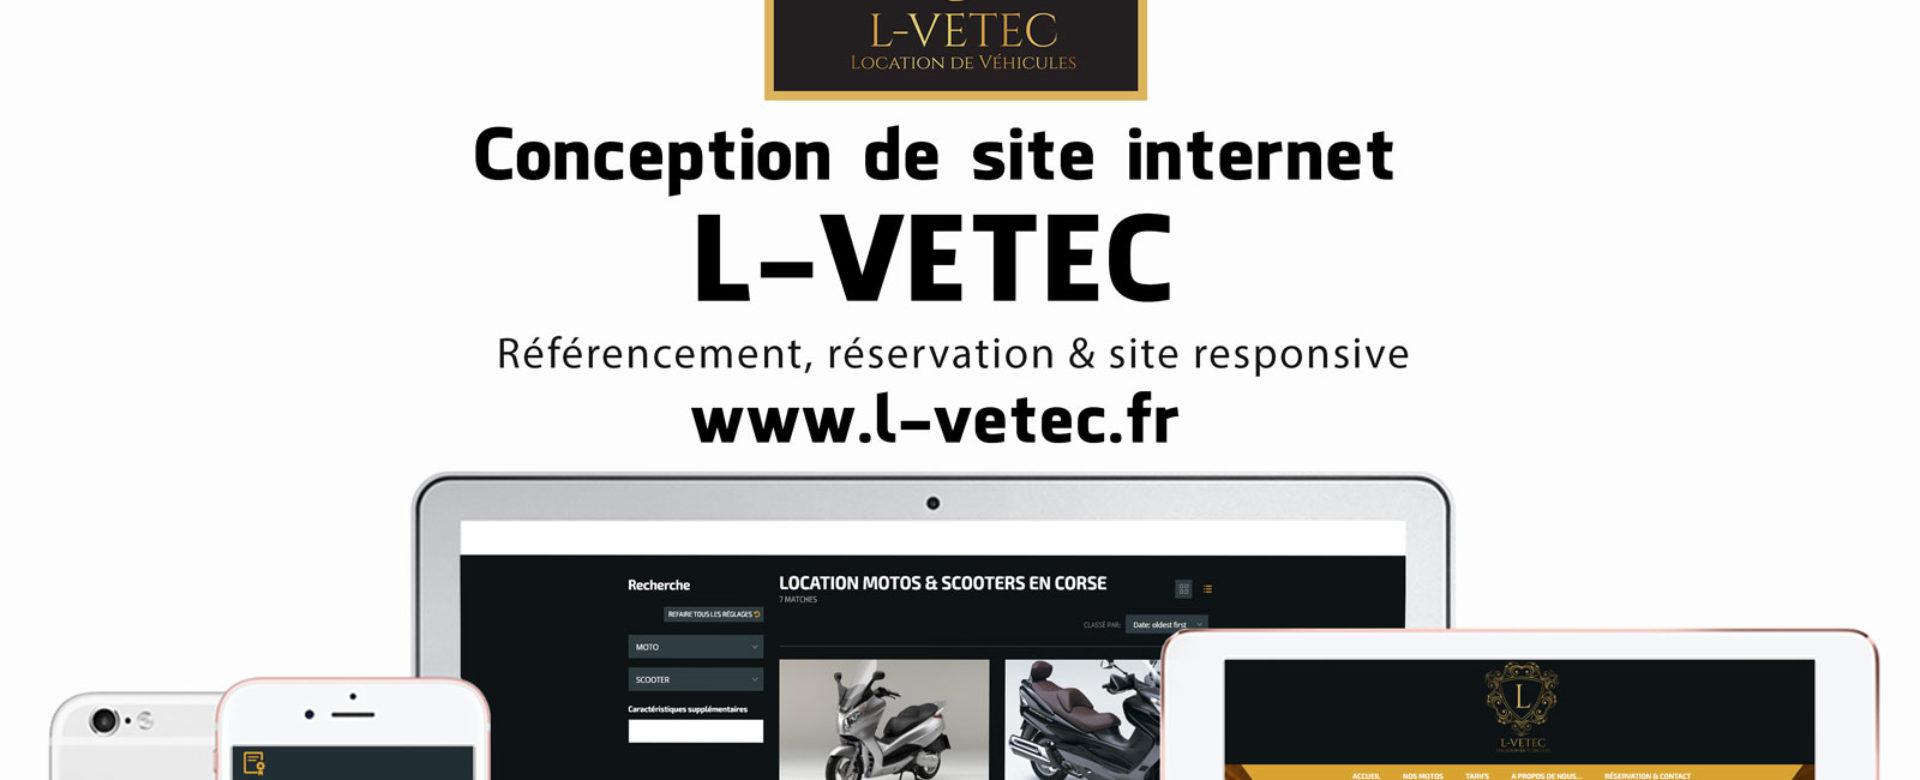 l-vetec-site-web-agence-communication-corse